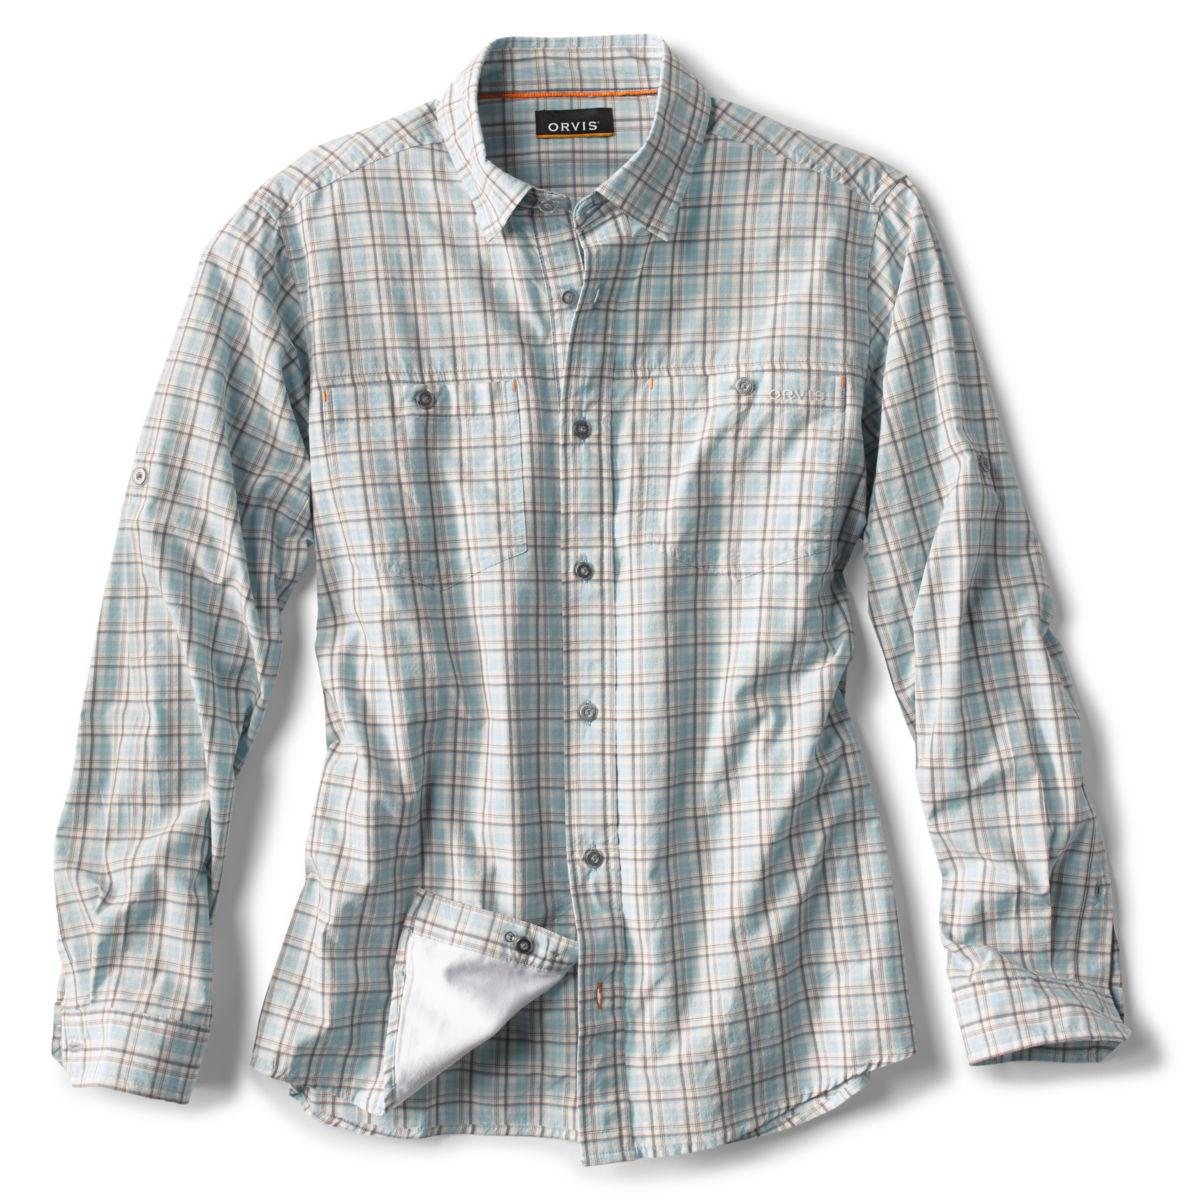 Escape Long-Sleeved Shirt - SKYLINEimage number 0